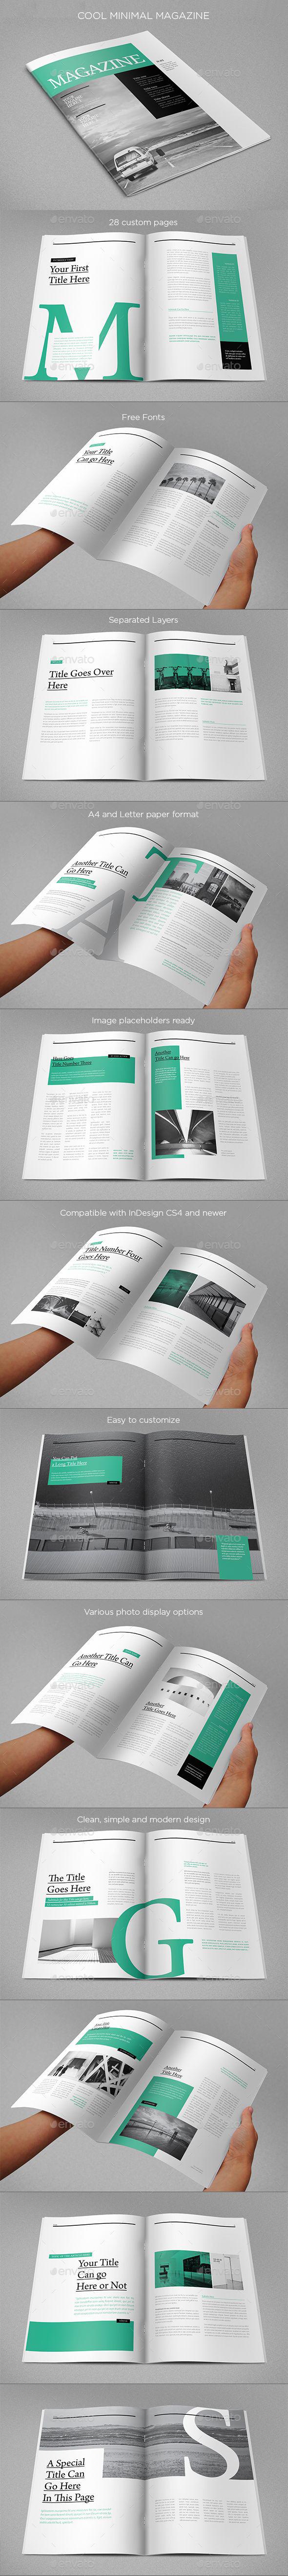 Cool Minimal Magazine - Magazines Print Templates